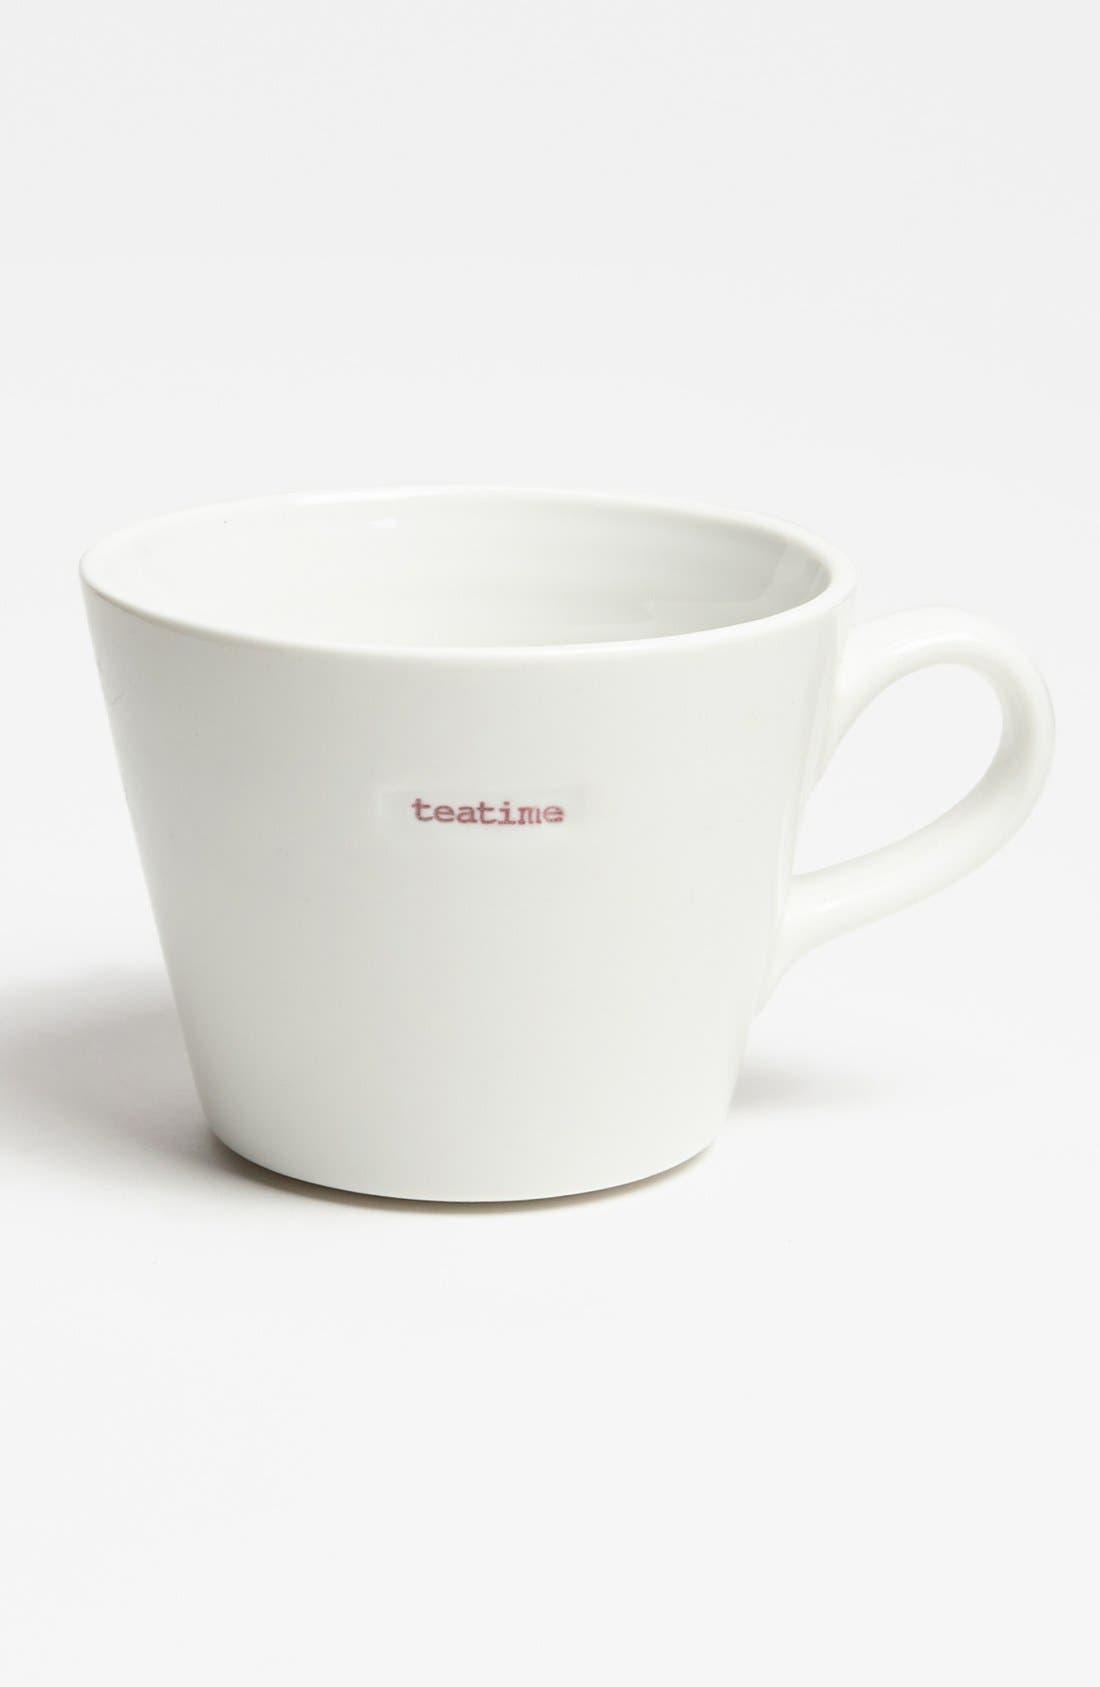 Alternate Image 1 Selected - 'Word Range - Teatime' Porcelain Mug